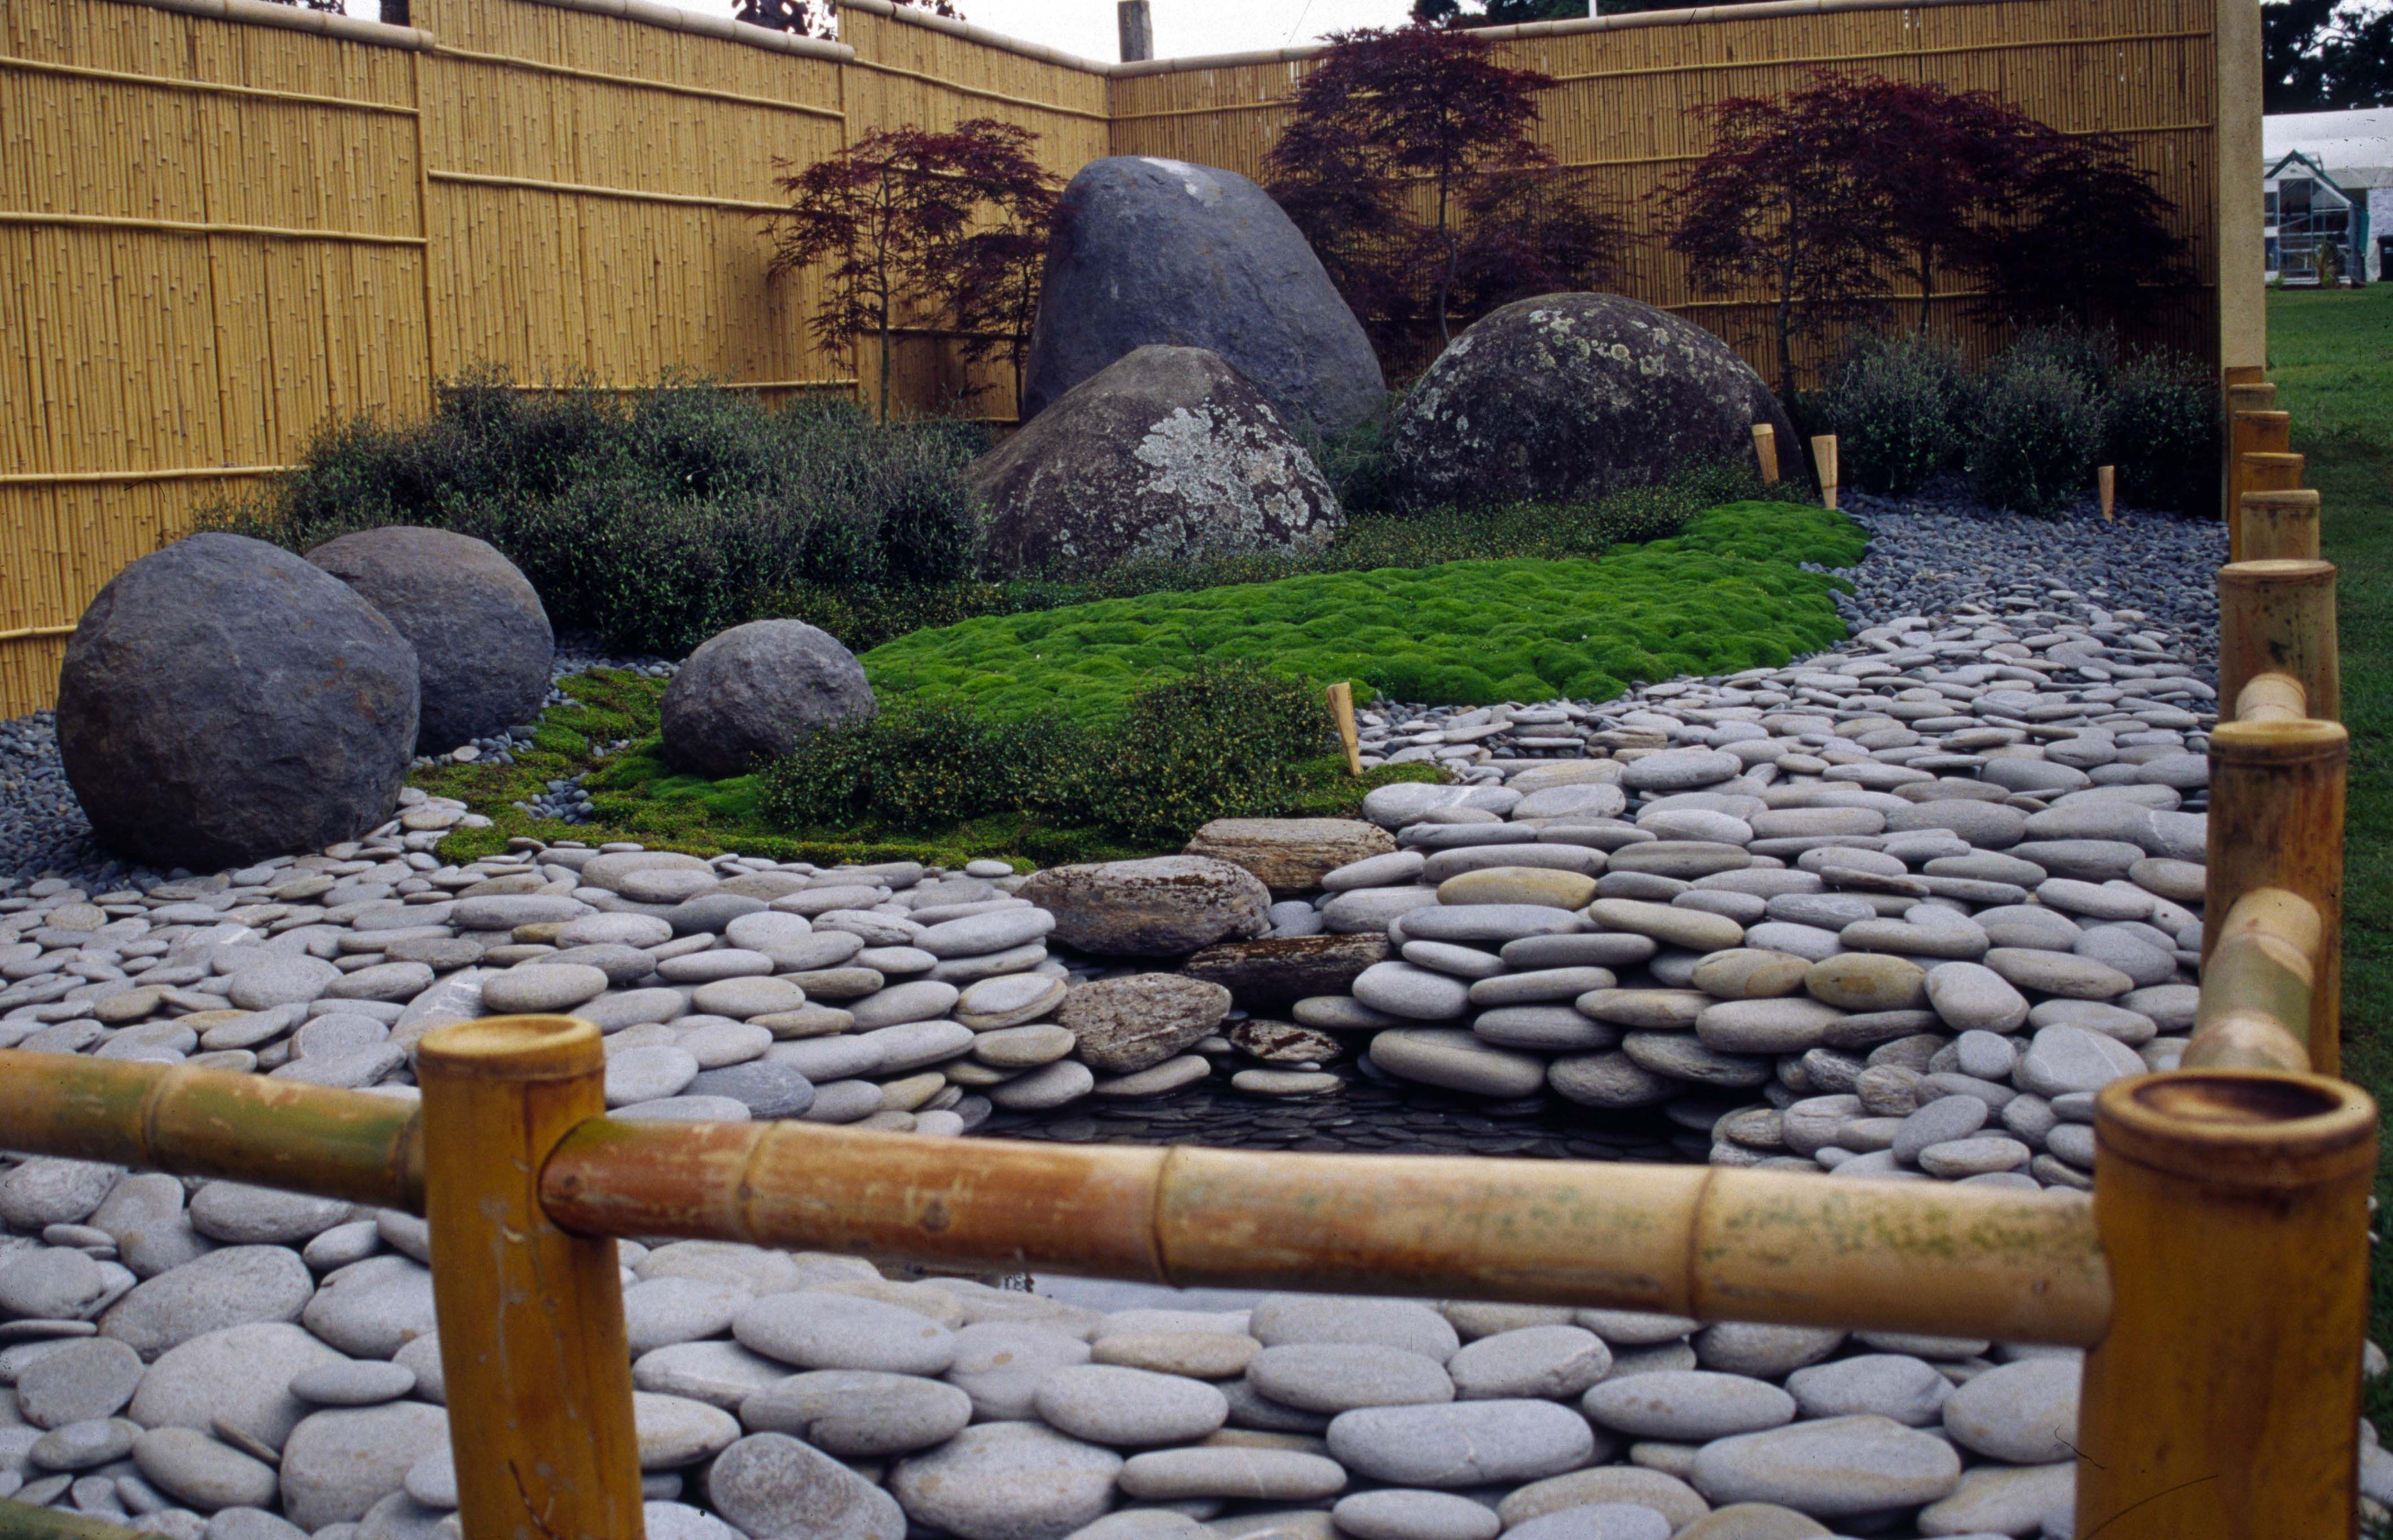 Pebble Gardens Small Garden Pebbles Japanese Landscaping. Modern Living  Magazine. Home Inside Decoration.